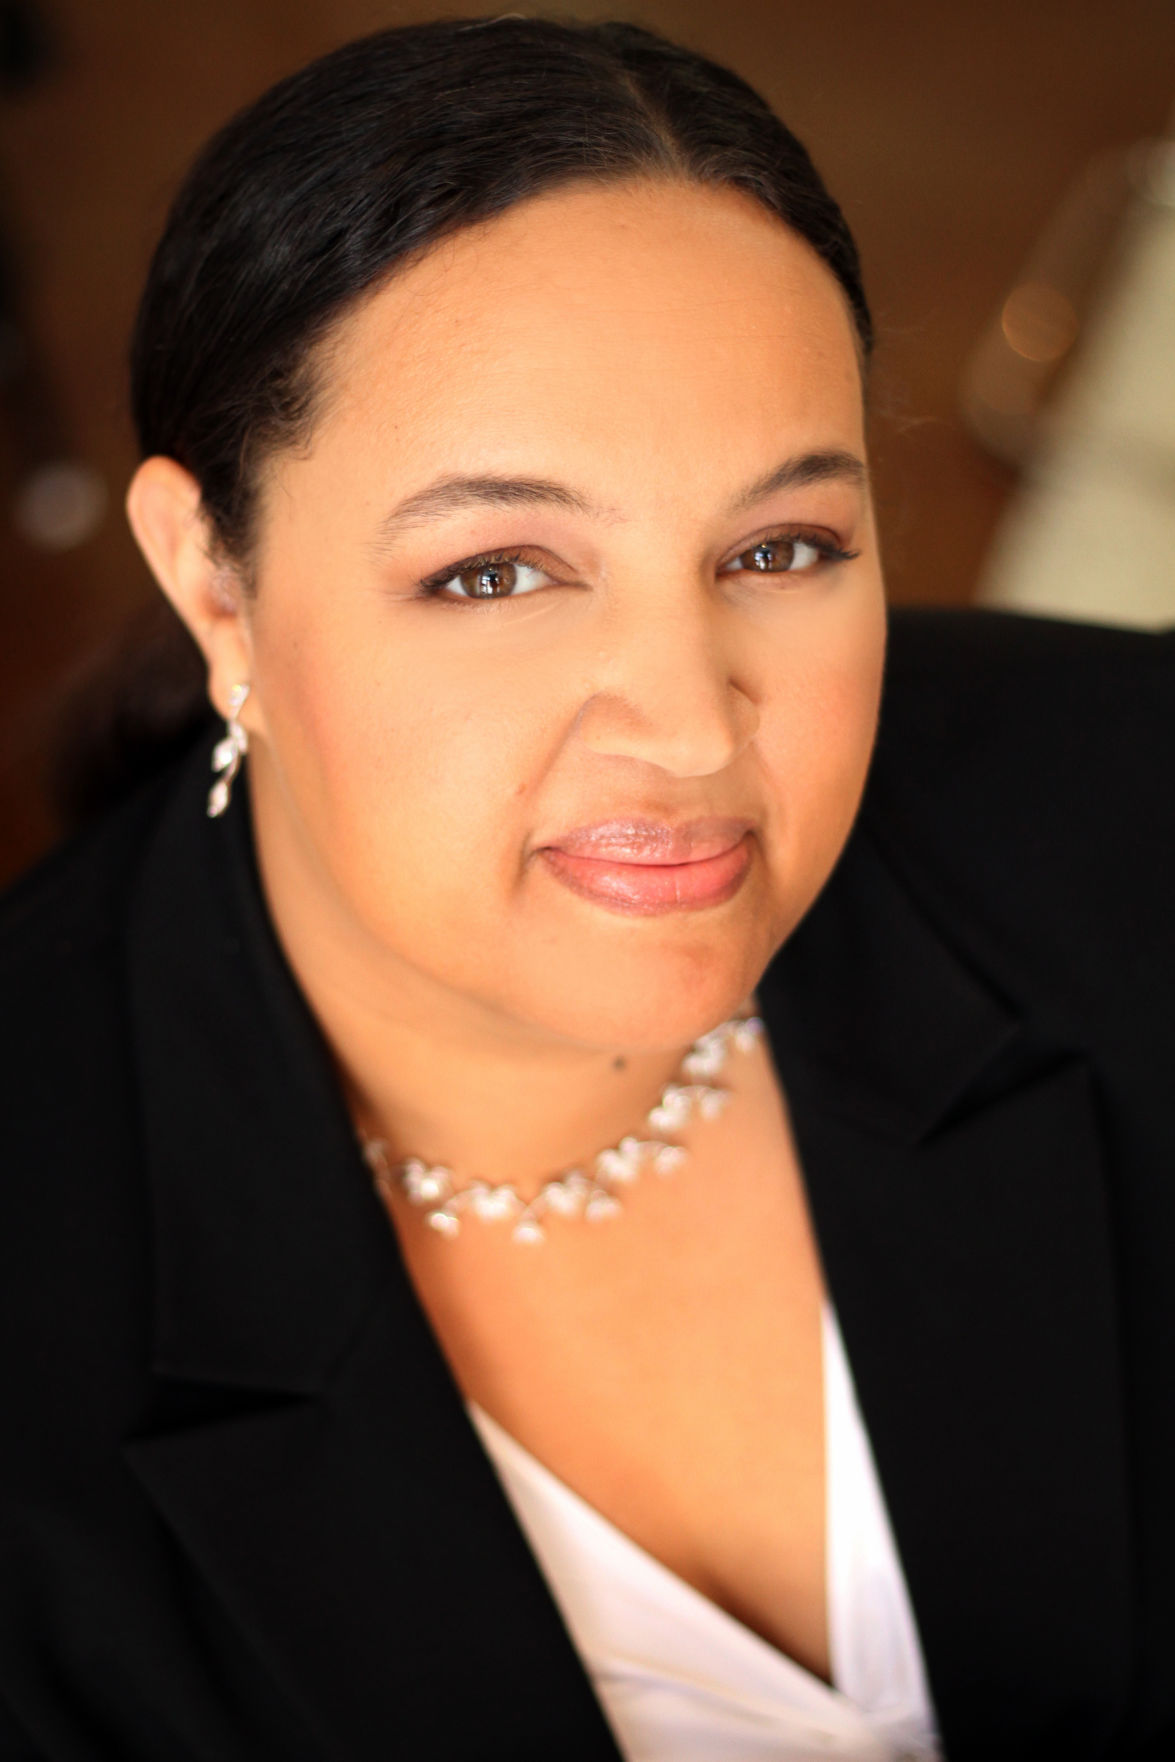 Veronica Foster